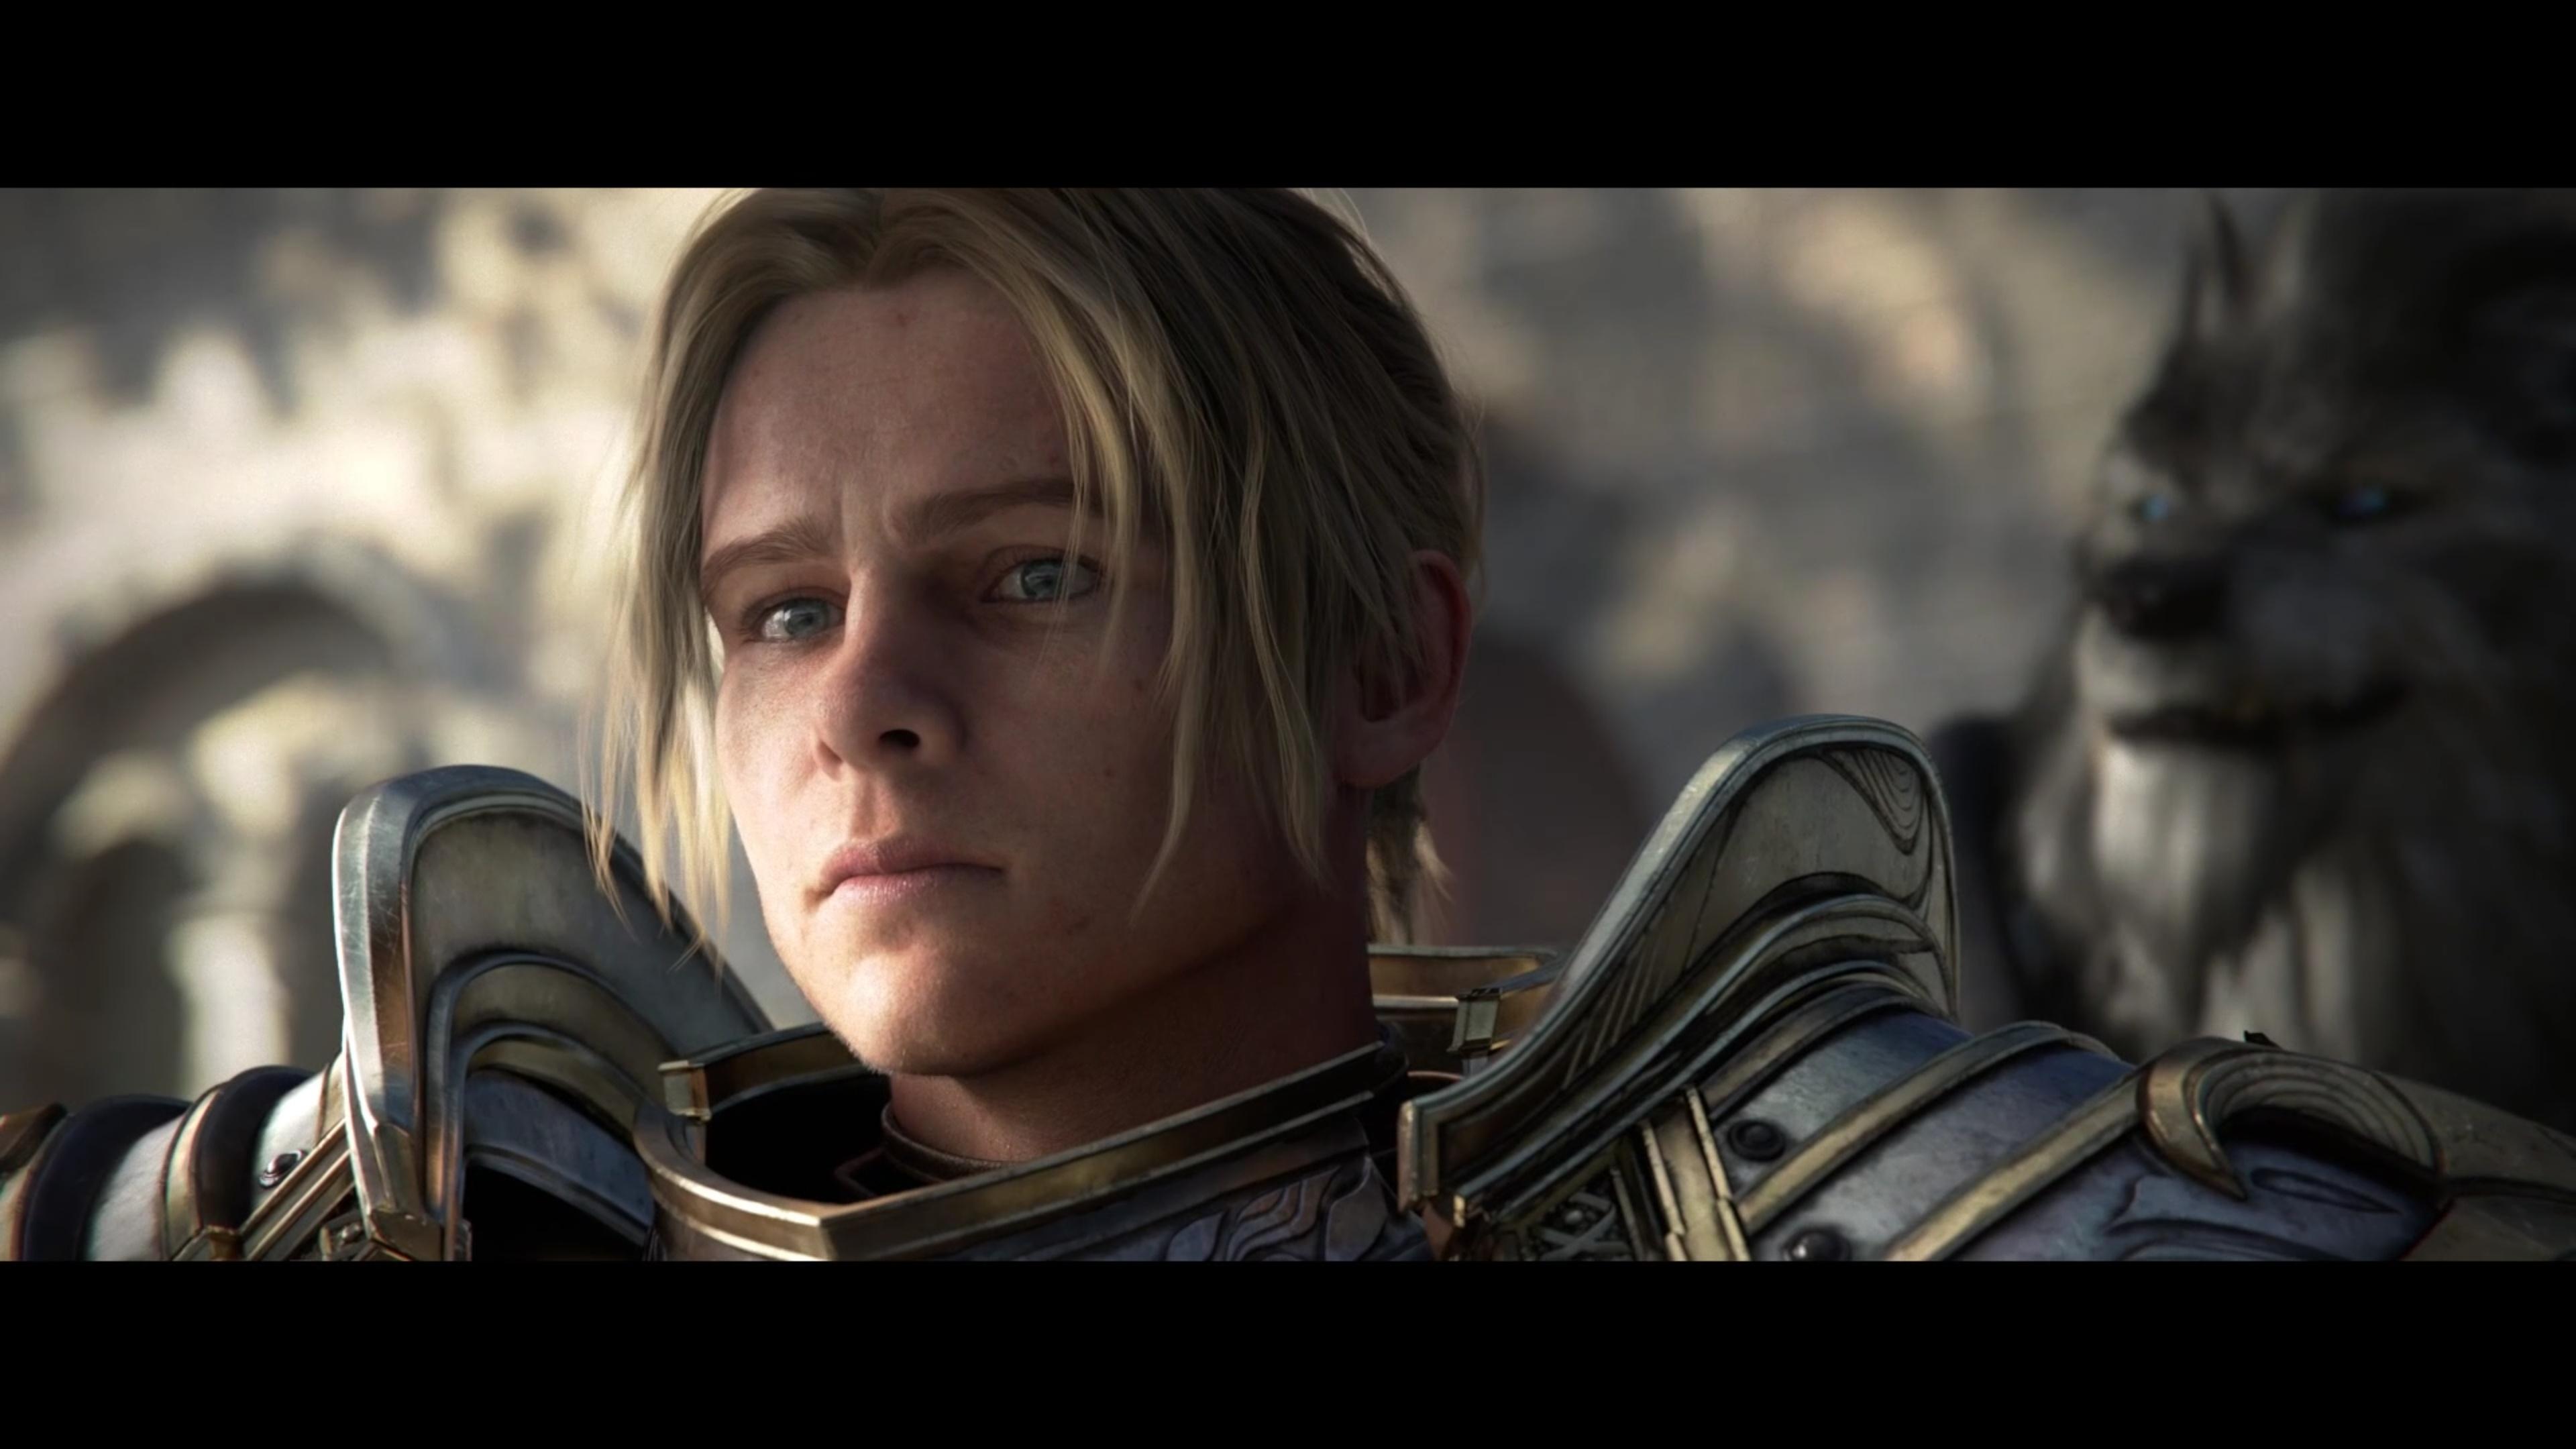 bfa in game cinematics